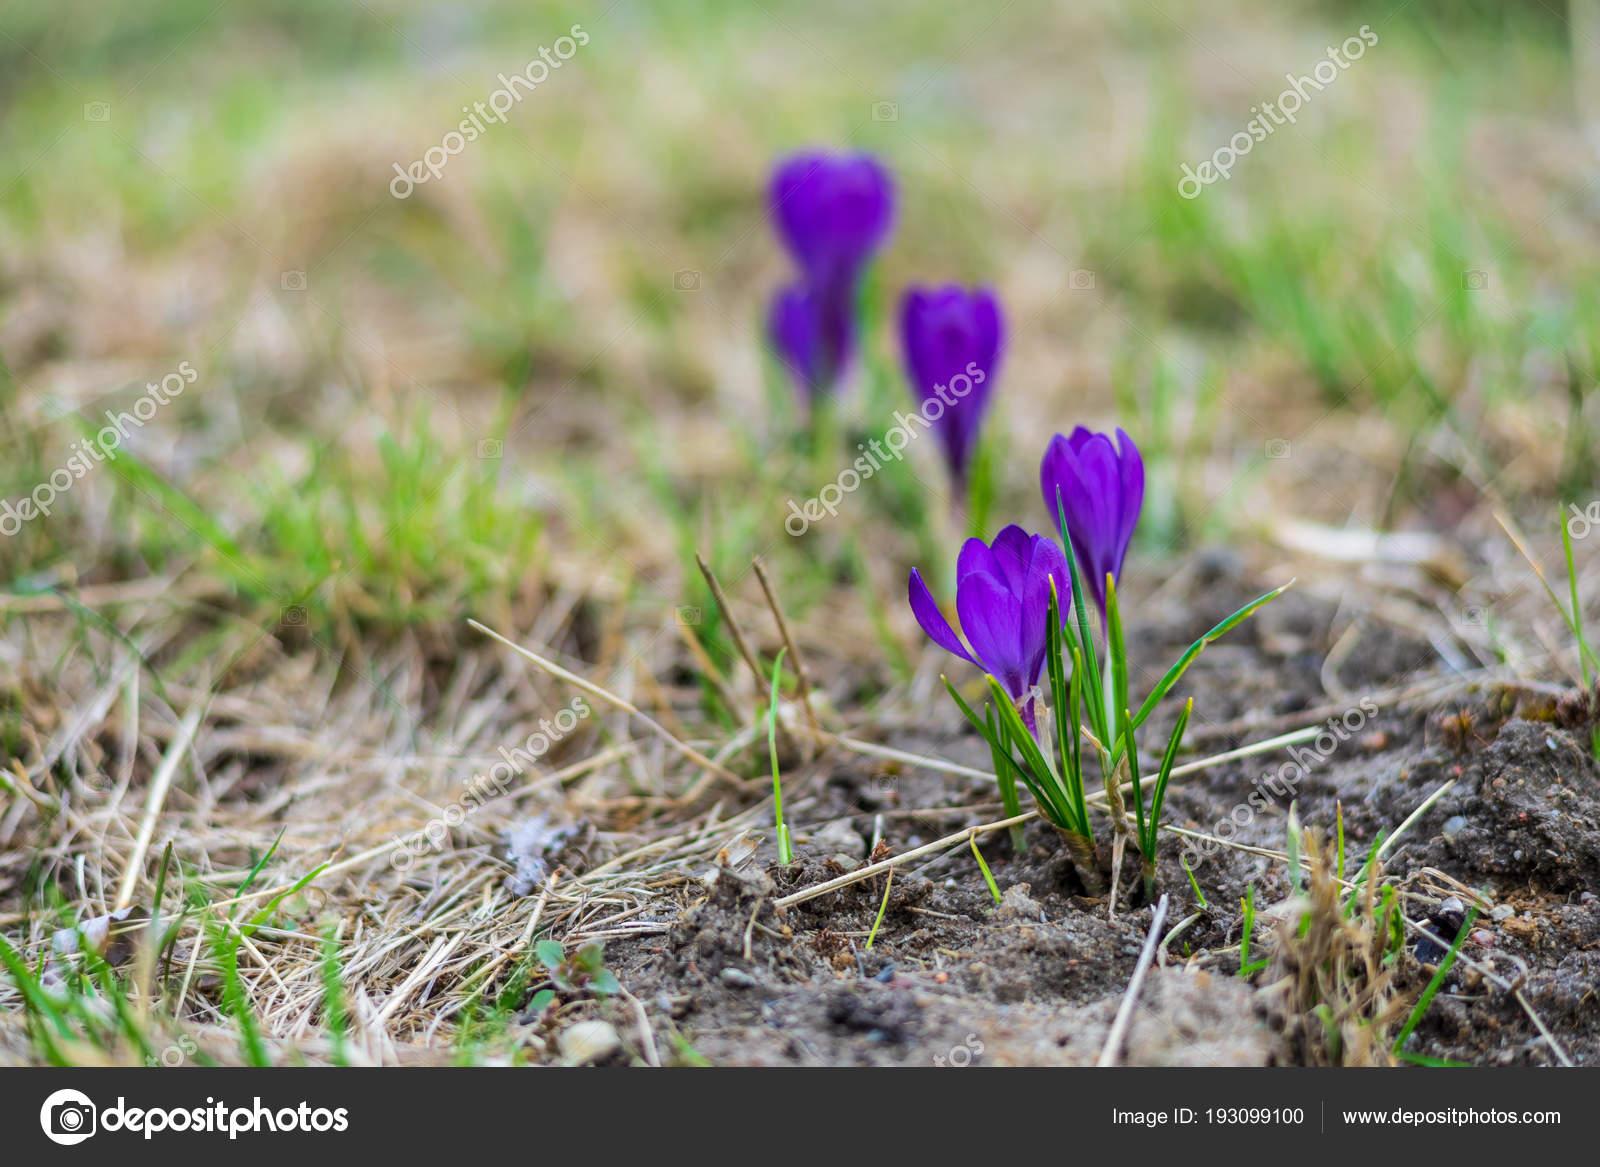 First spring flowers crocus crocus sativus meadow stock photo first spring flowers crocus crocus sativus meadow stock photo mightylinksfo